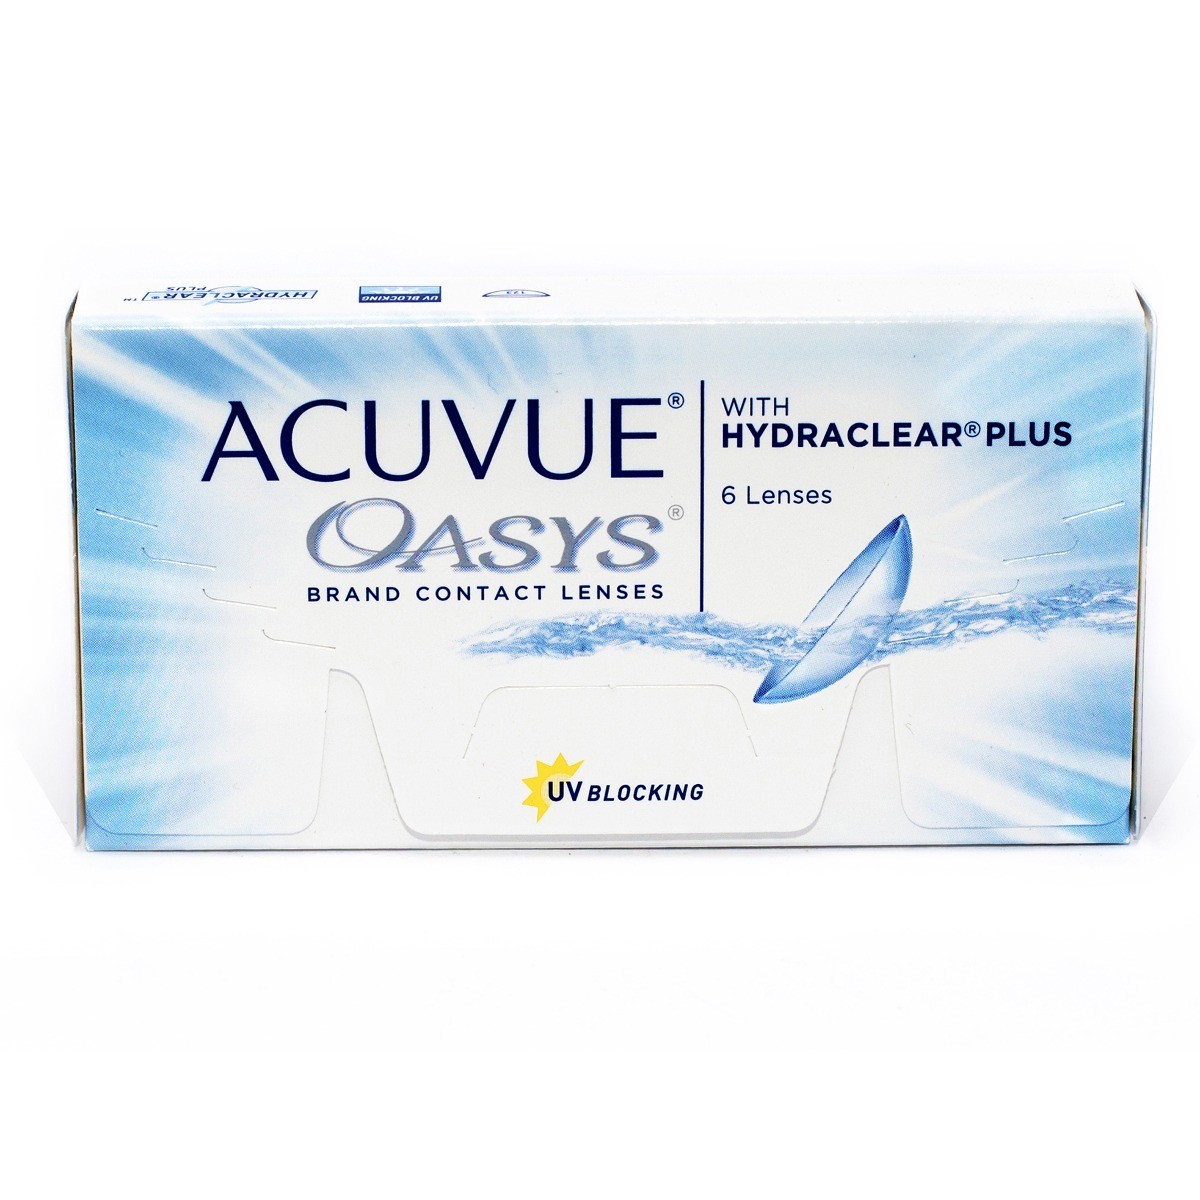 32e54ee866e4b Lentes De Contato Acuvue Oasys Com Hydraclear Plus Grau-4.25 - R ...